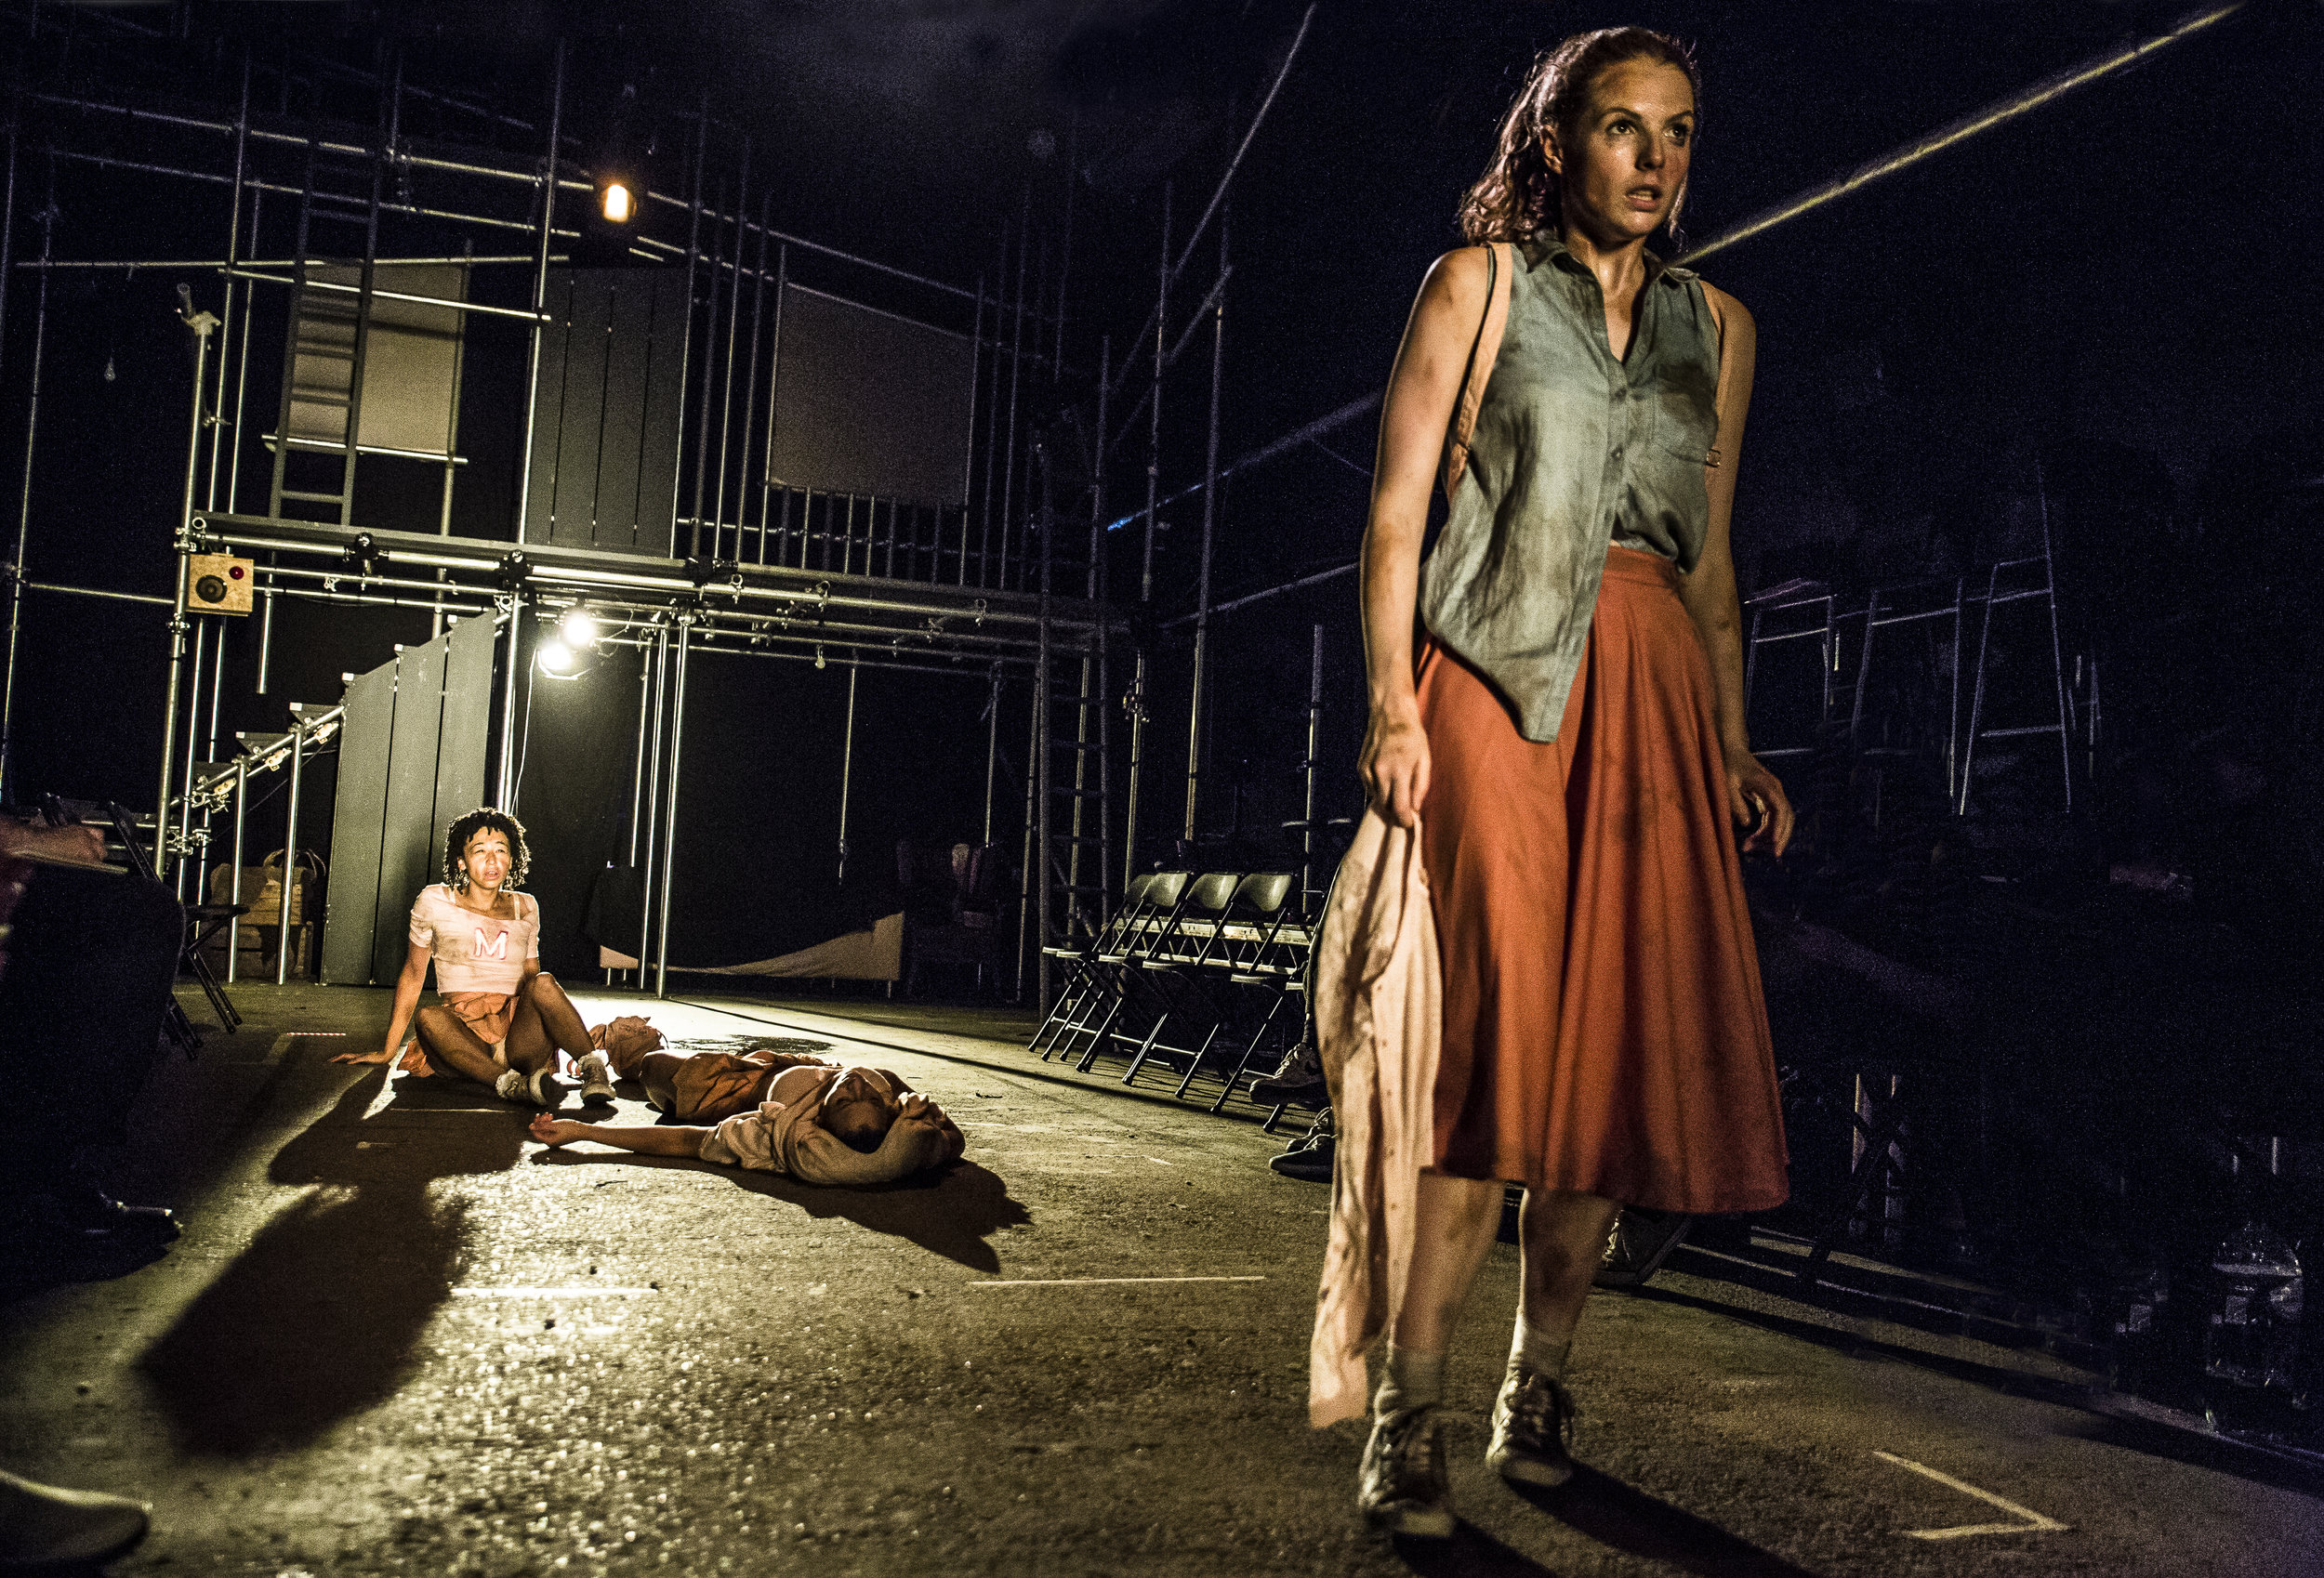 Karagula-at-The-Styx-courtesy-of-Lara-Genovese-@-Naiad-Photography-Emily-Forbes-Charmaine-Wombwell-and-Emily-Burnett.jpg